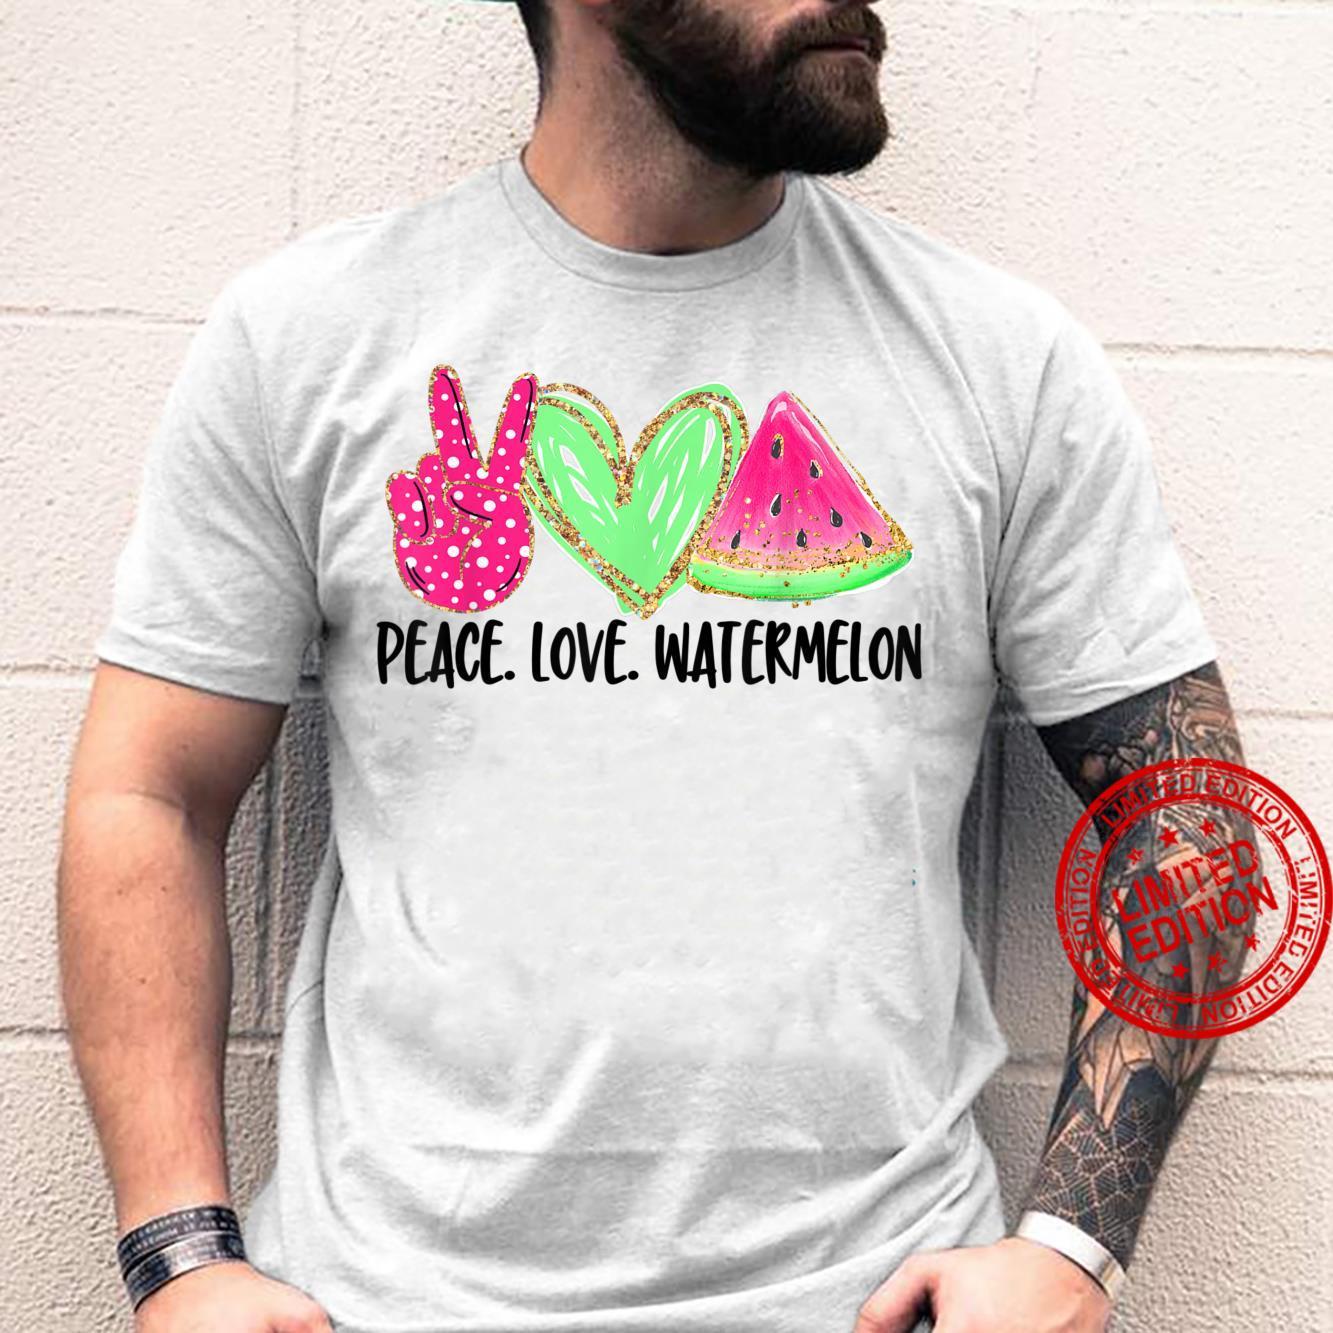 Peace Love Watermelon Happy Watermelon Day Shirt